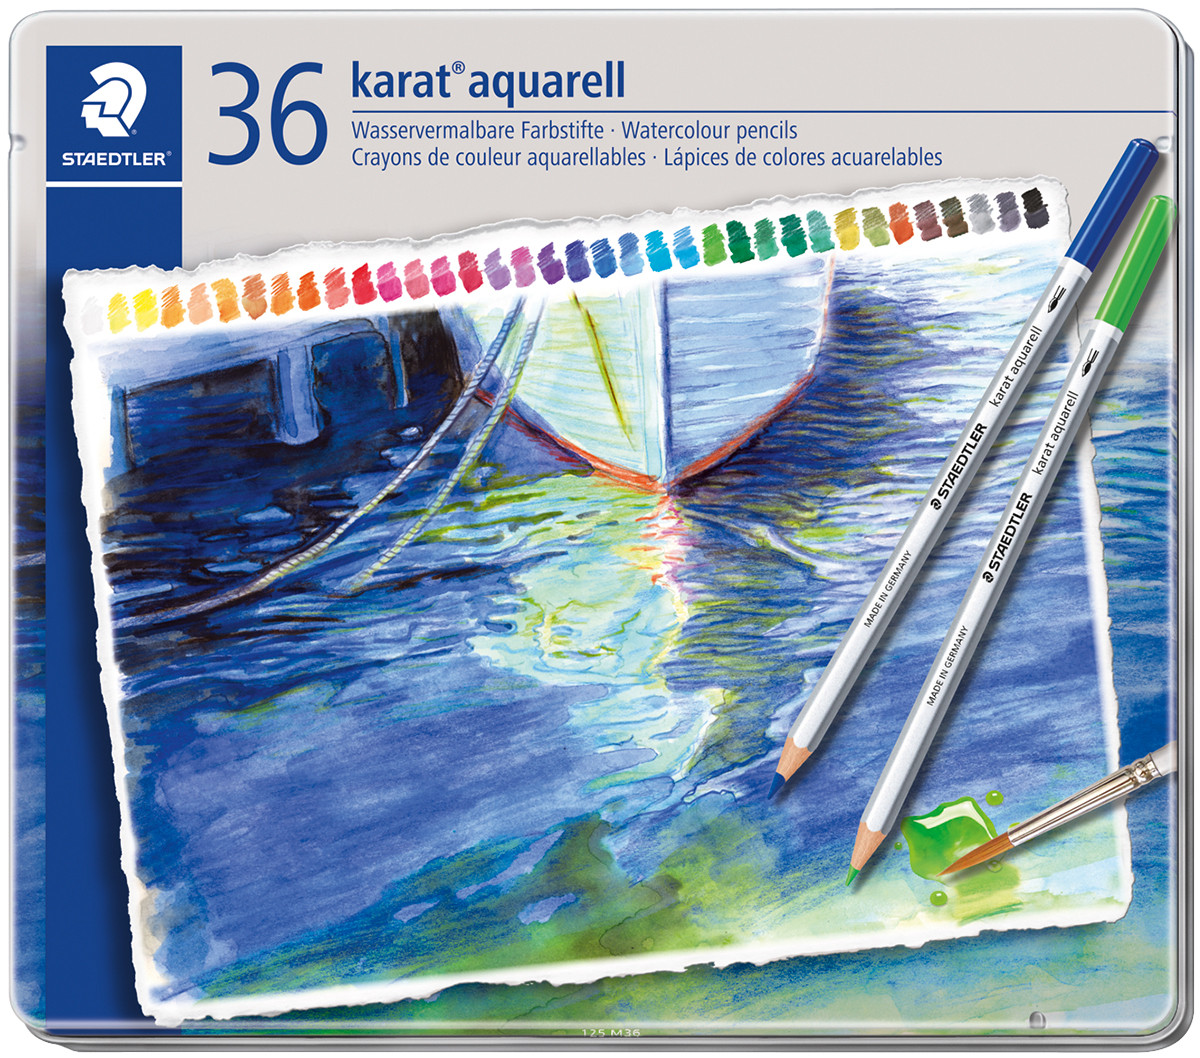 Staedtler Karat Aquarell Watercolour Pencils - Assorted Colours (Tin of 36)